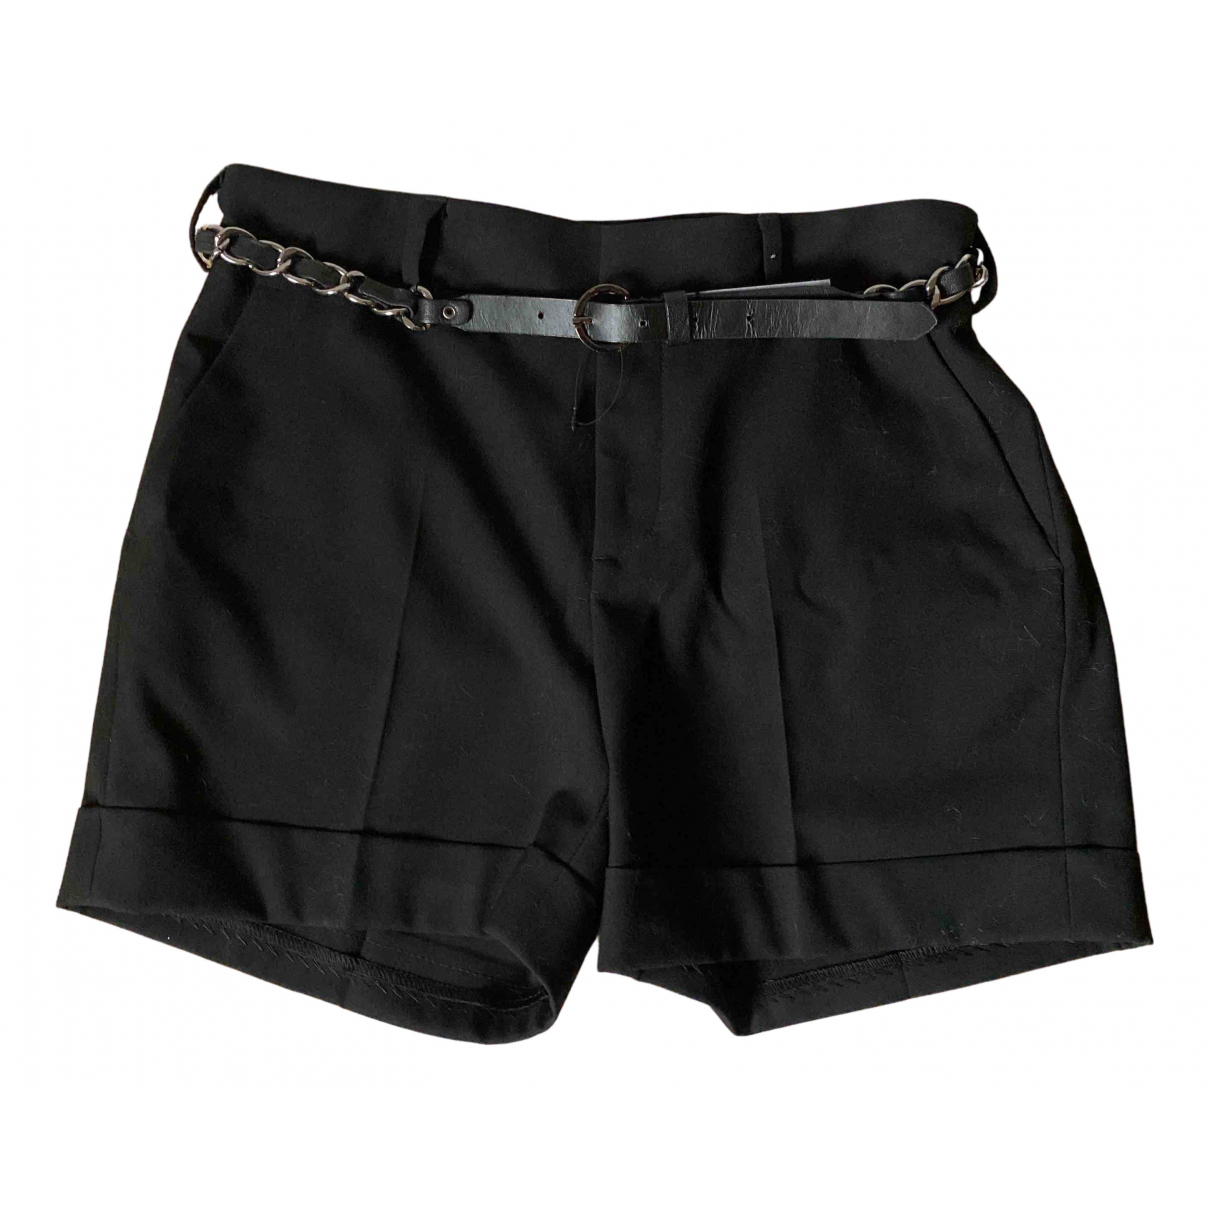 Zara N Black Shorts for Women S International